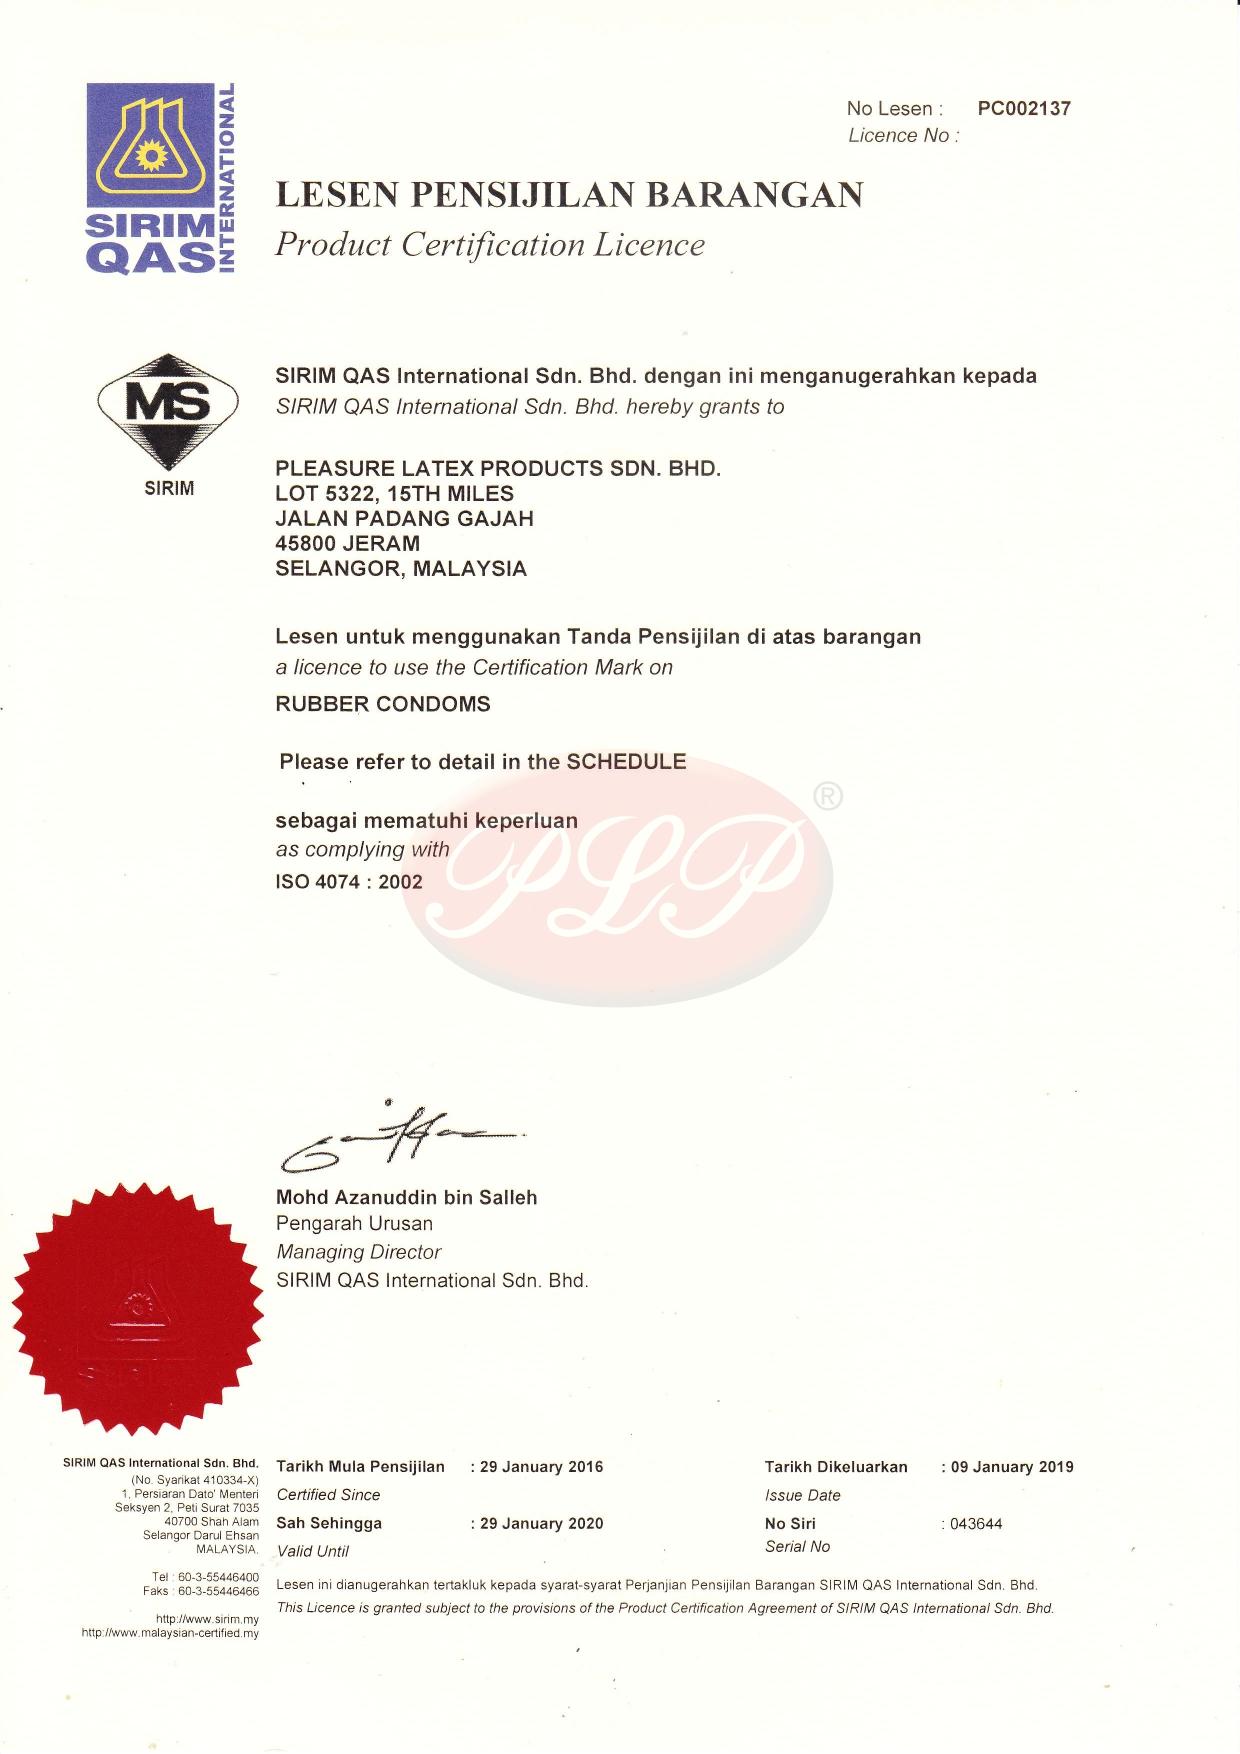 SIRIM Mark Certificate